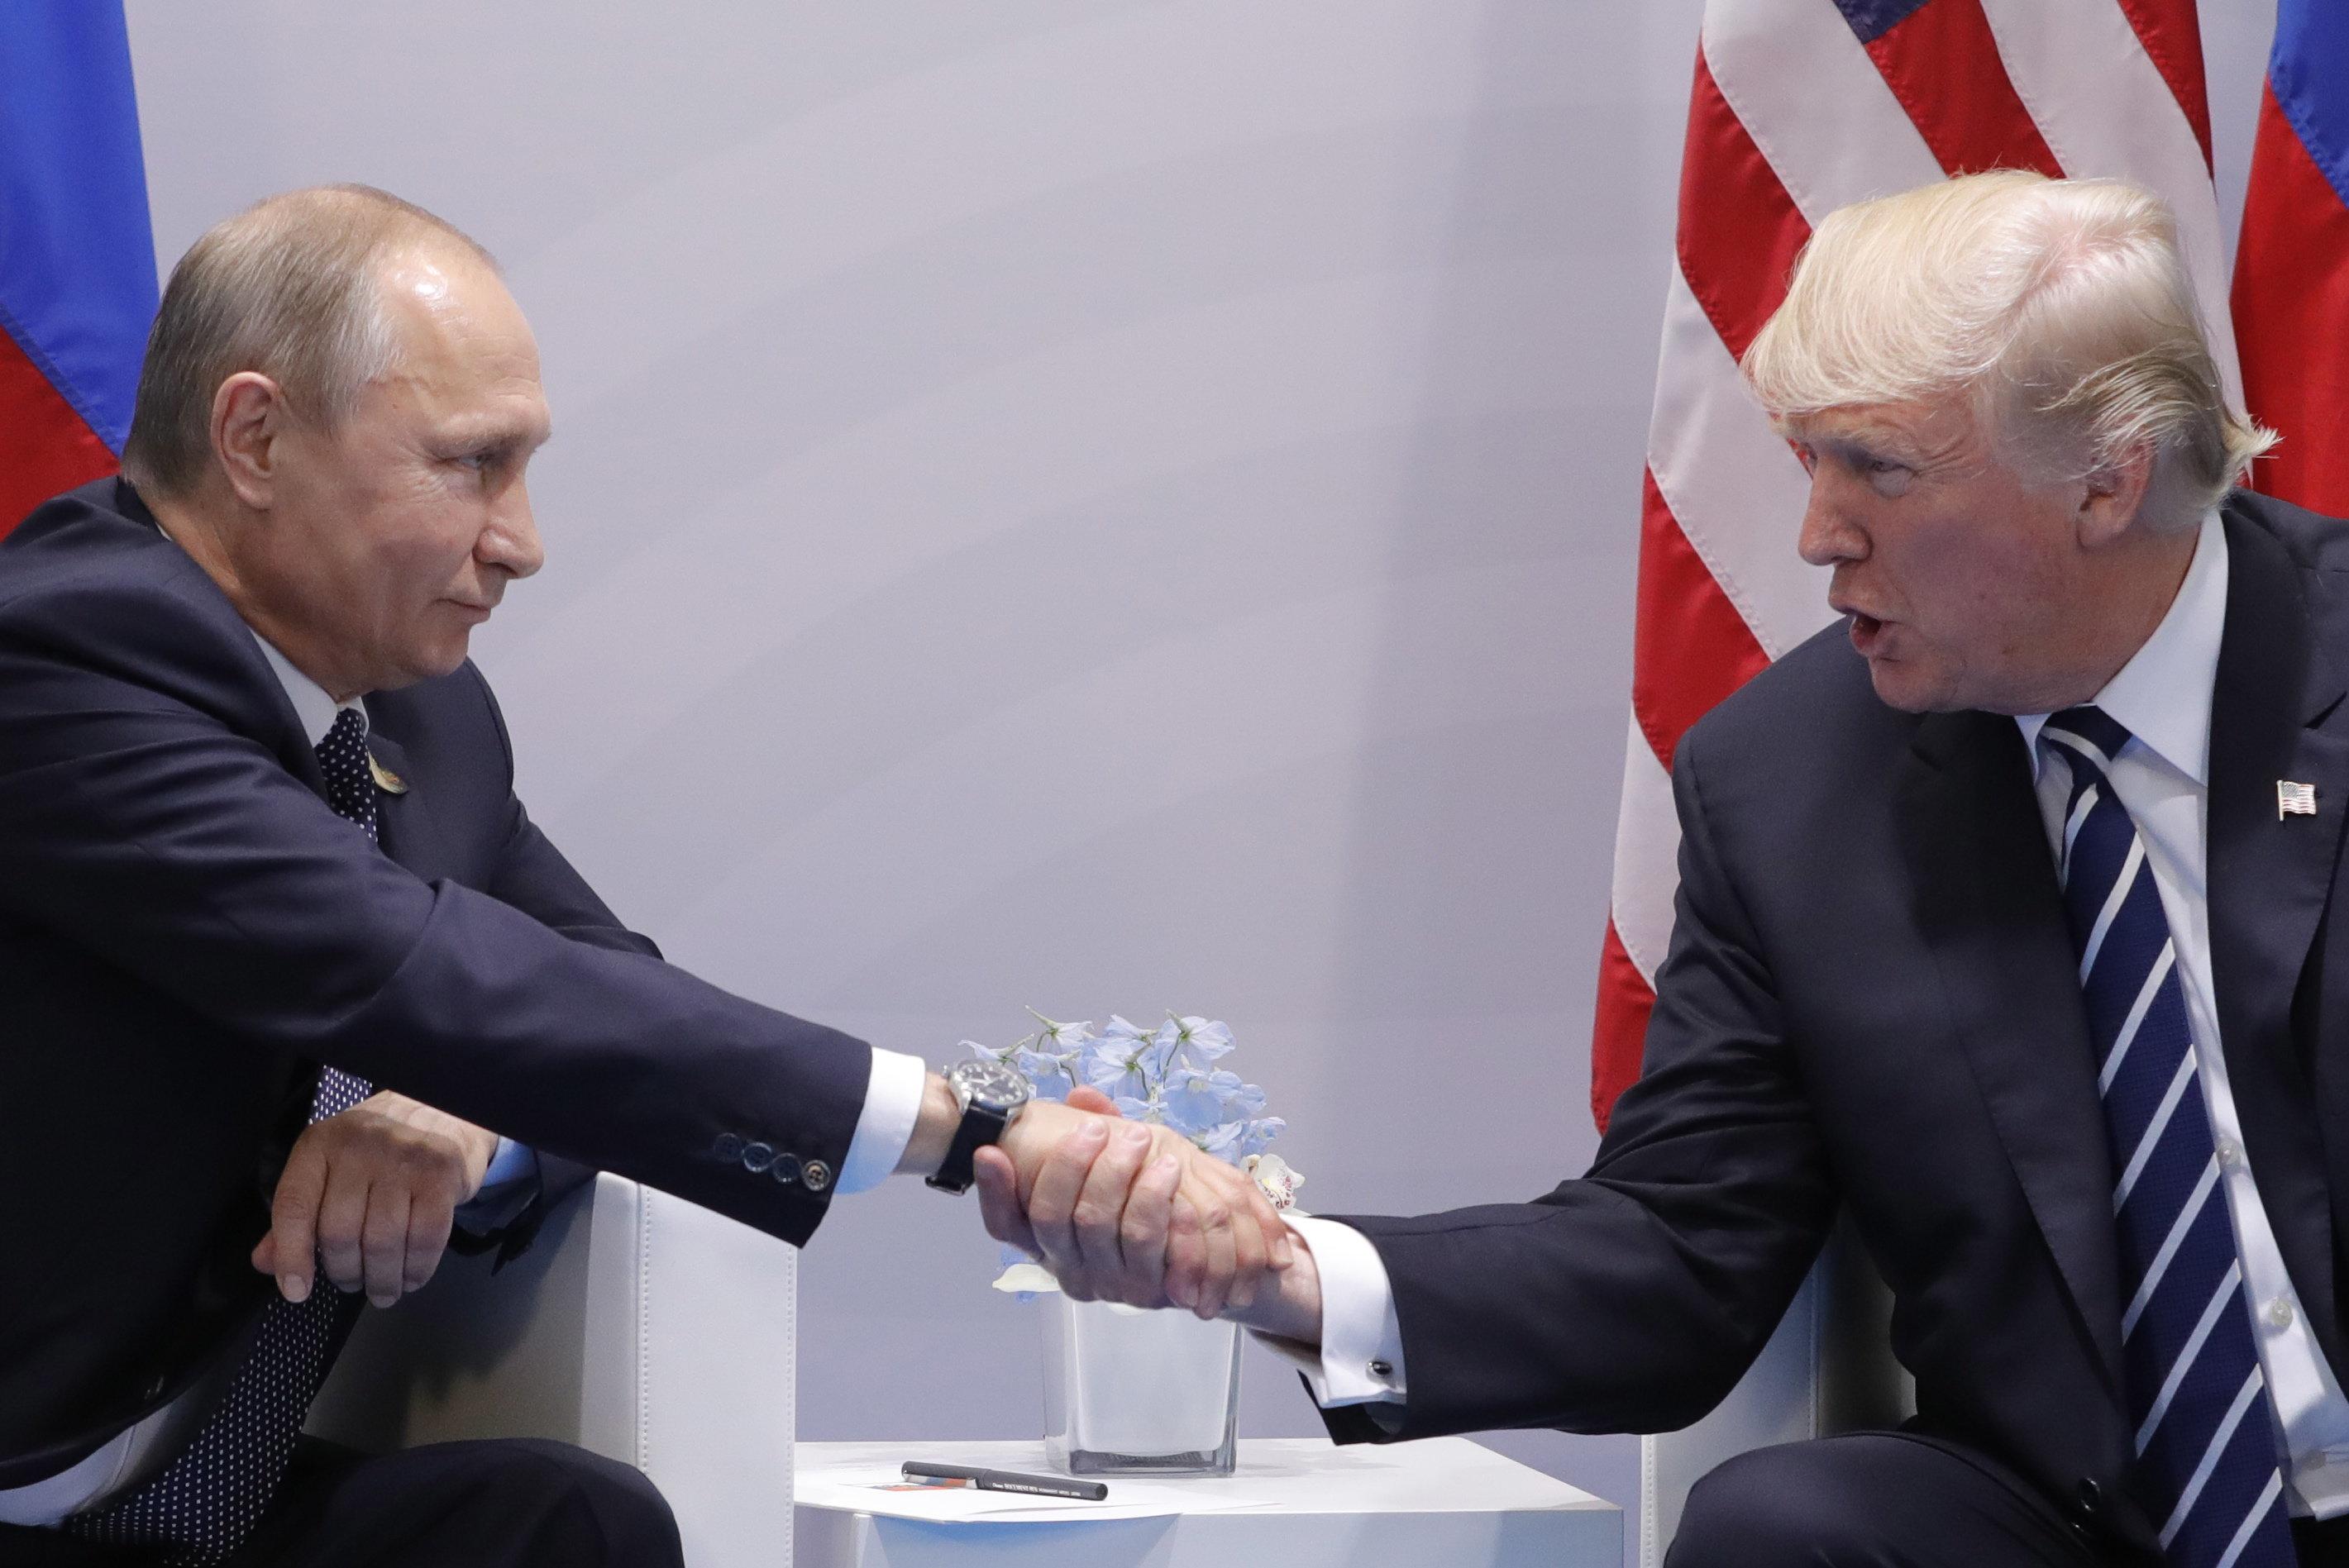 Putin and I will form